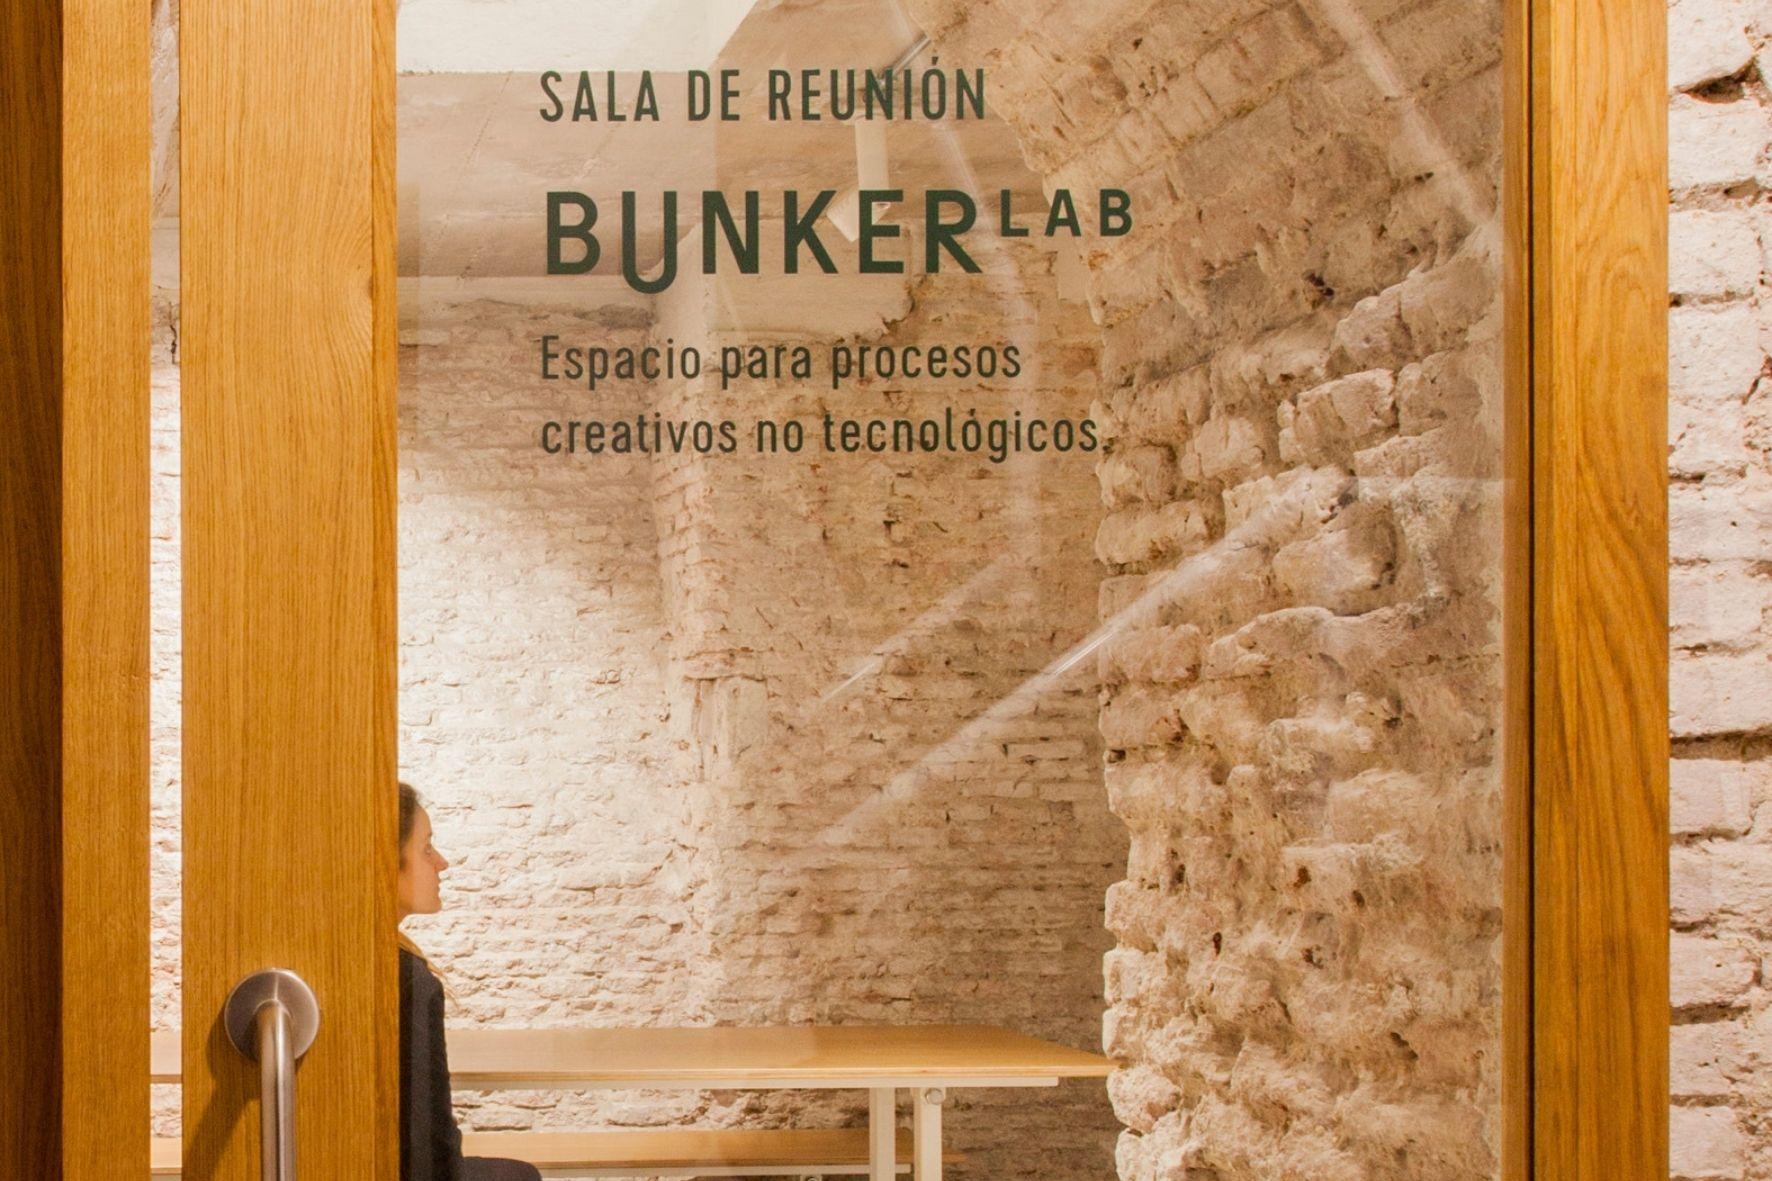 Bunker Lab